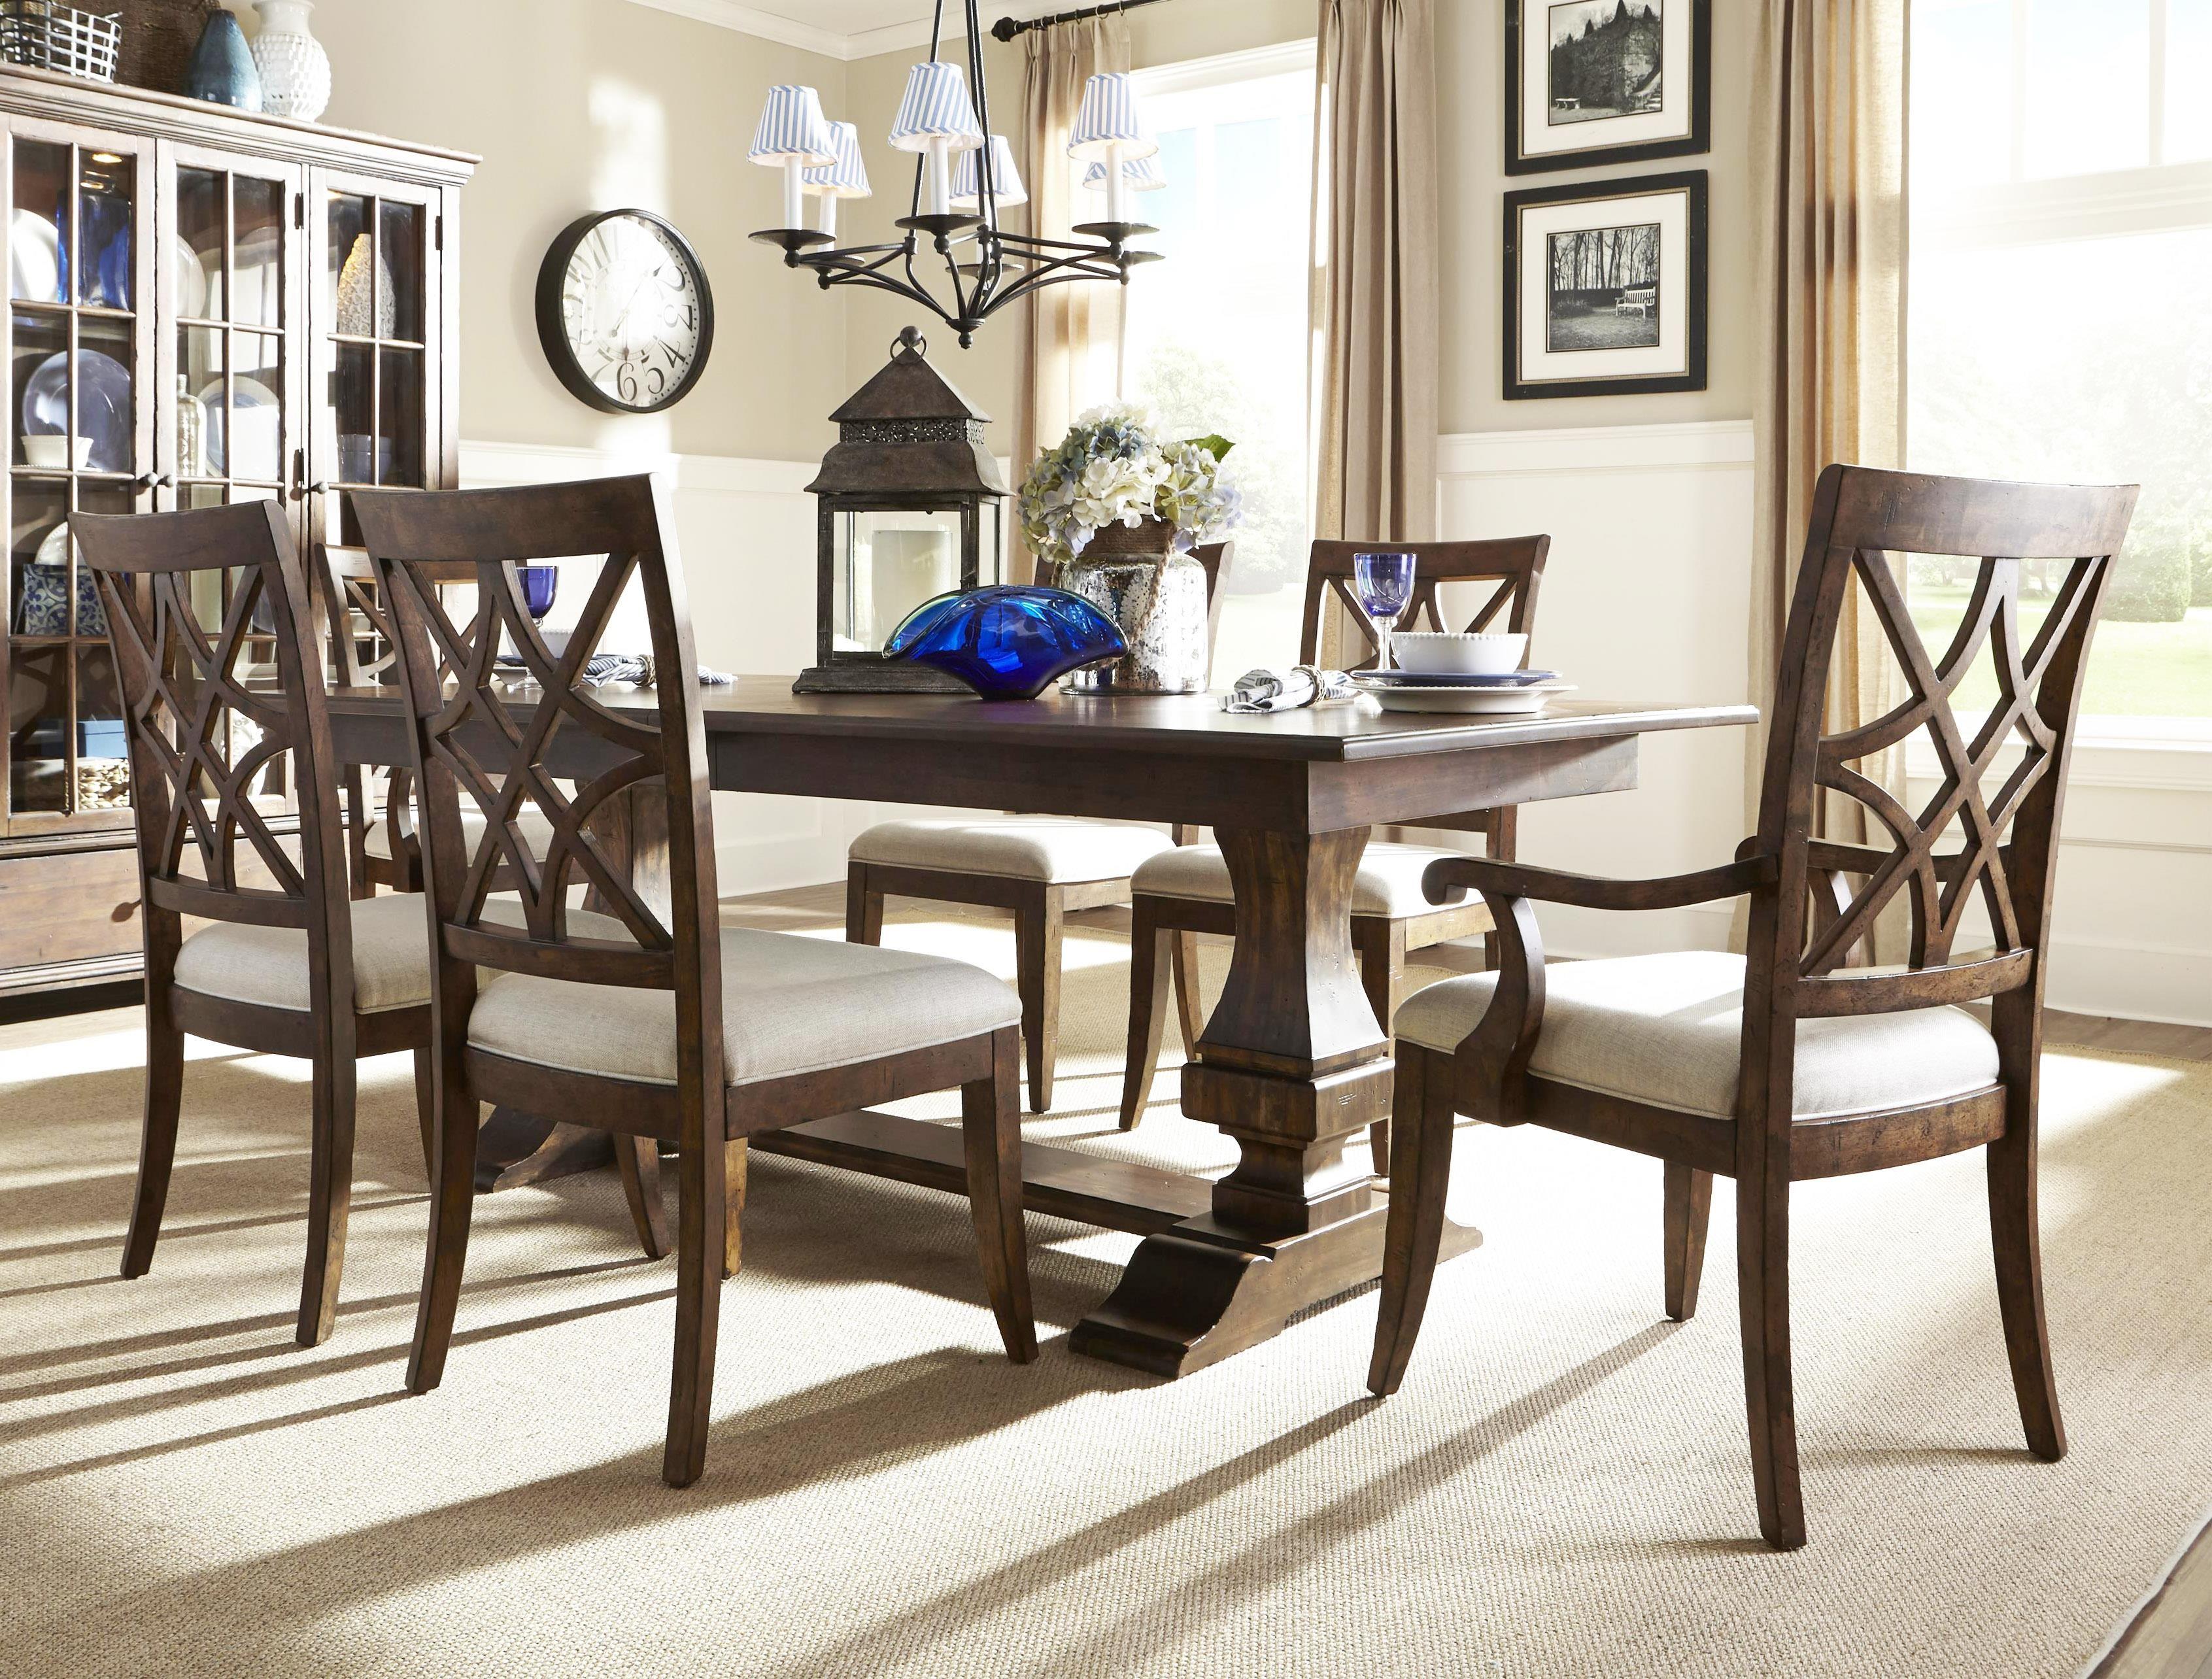 Trisha Yearwood Home 5 Piece Dining Set By Trisha Yearwood Home